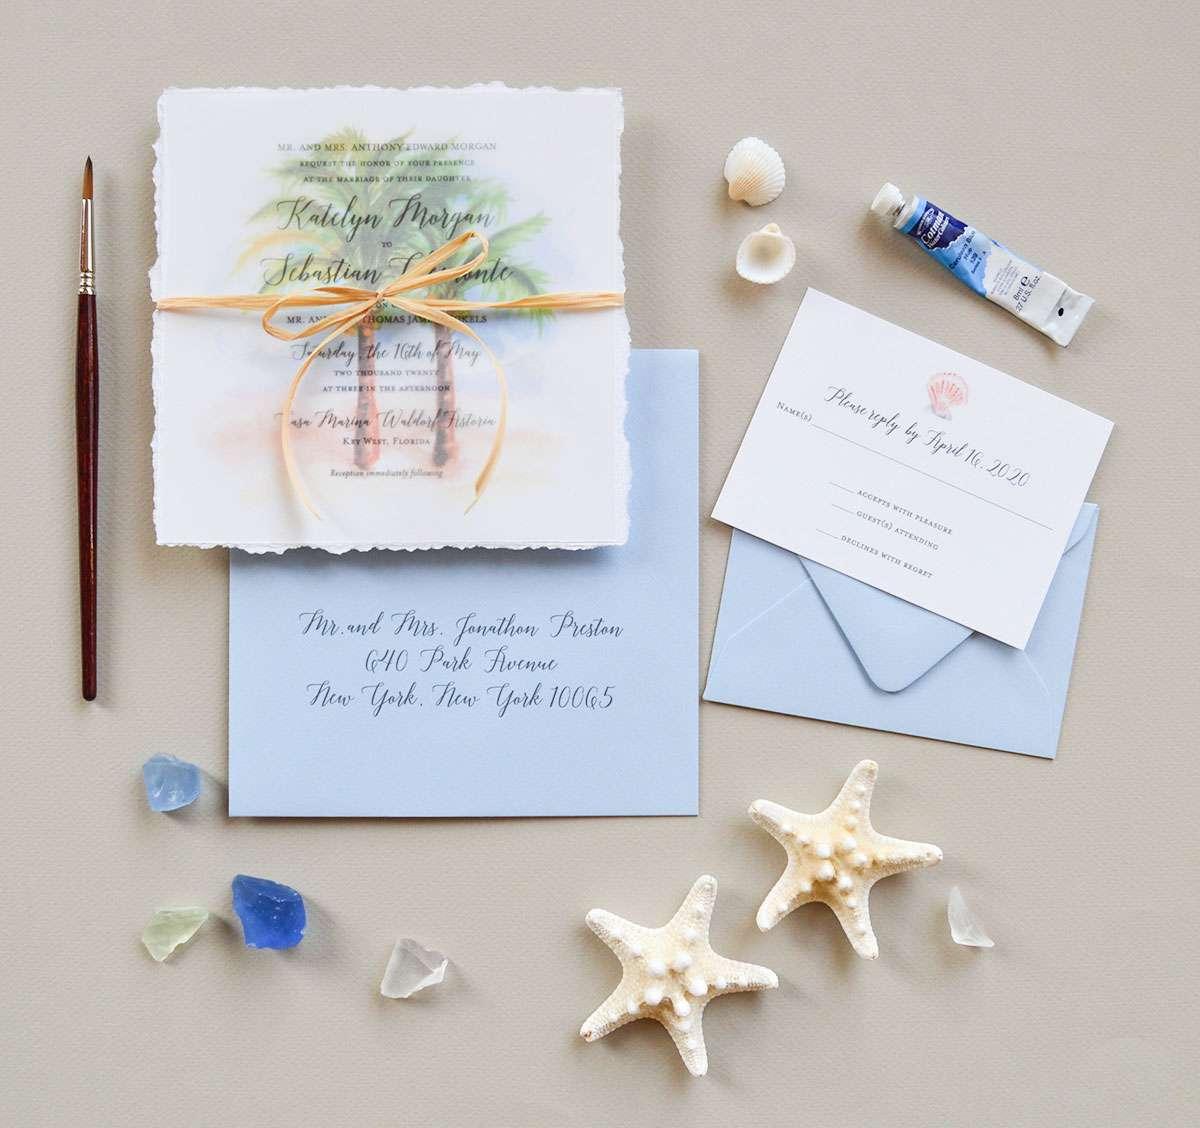 Handpainted palm tree wedding invitations